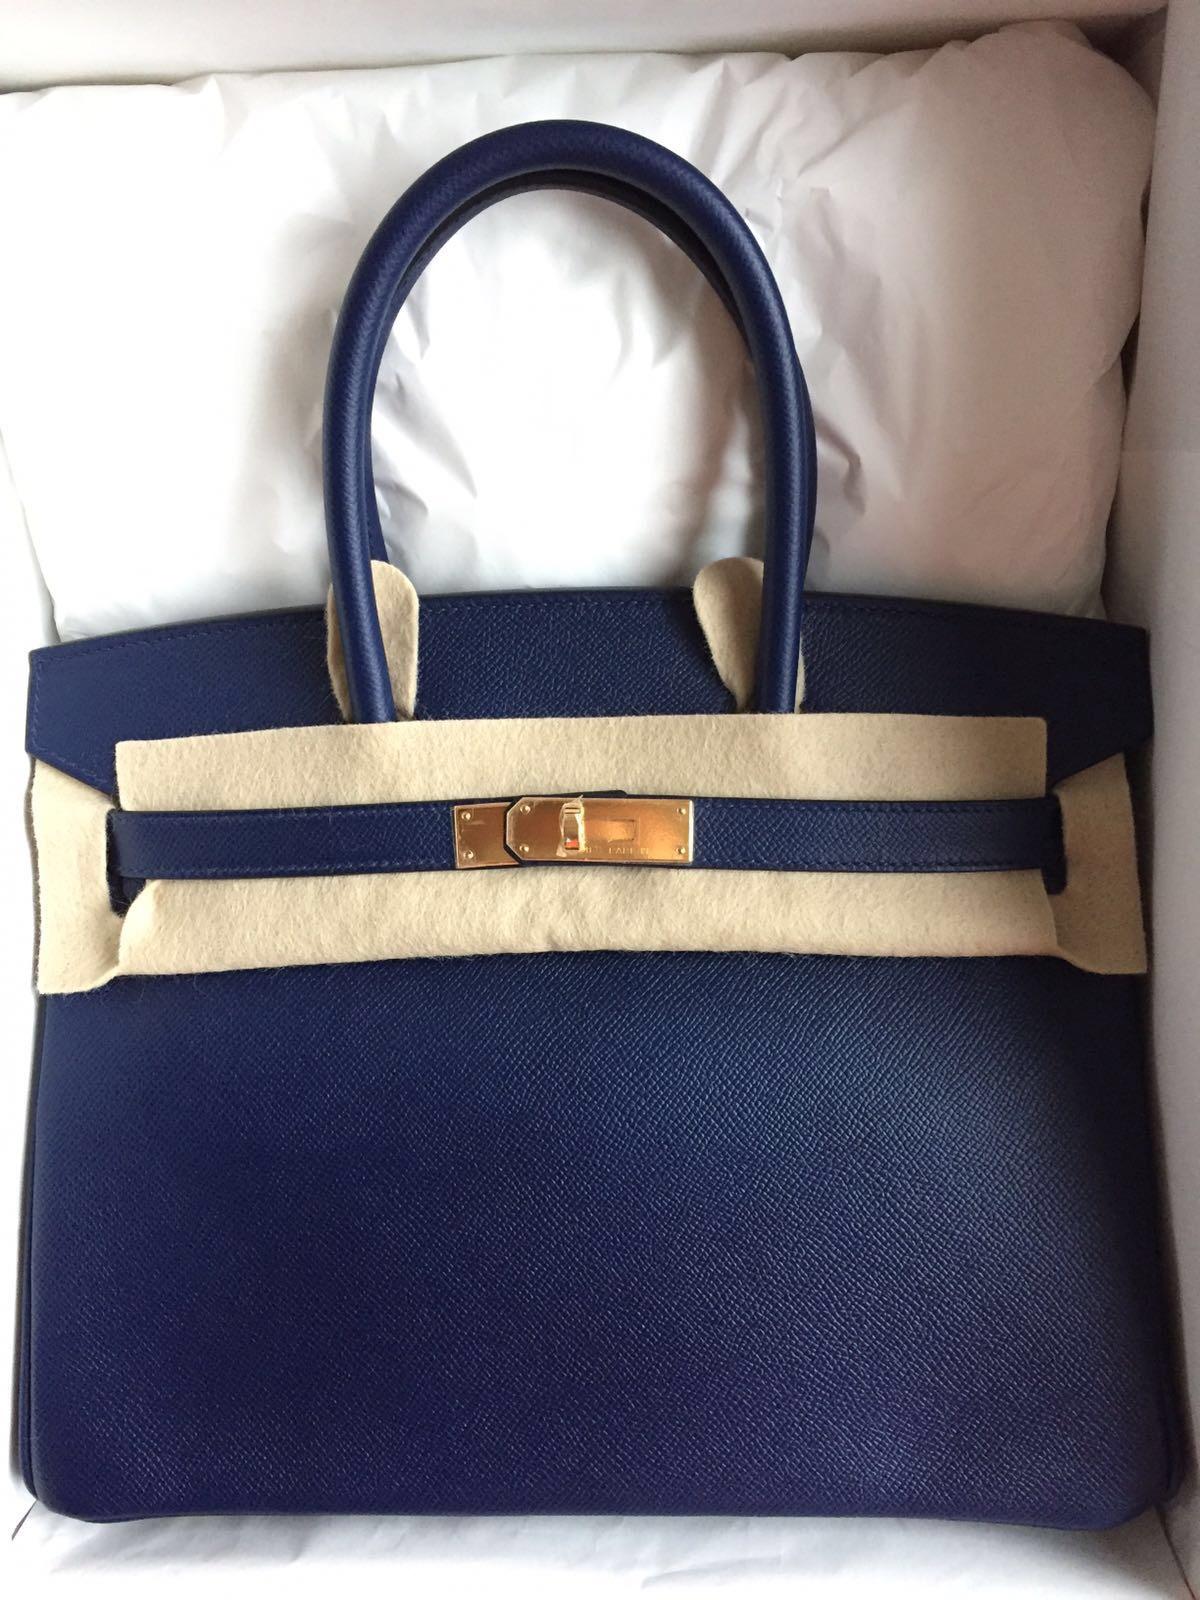 hermes 35cm birkin with gold hardware in epsom red satchel